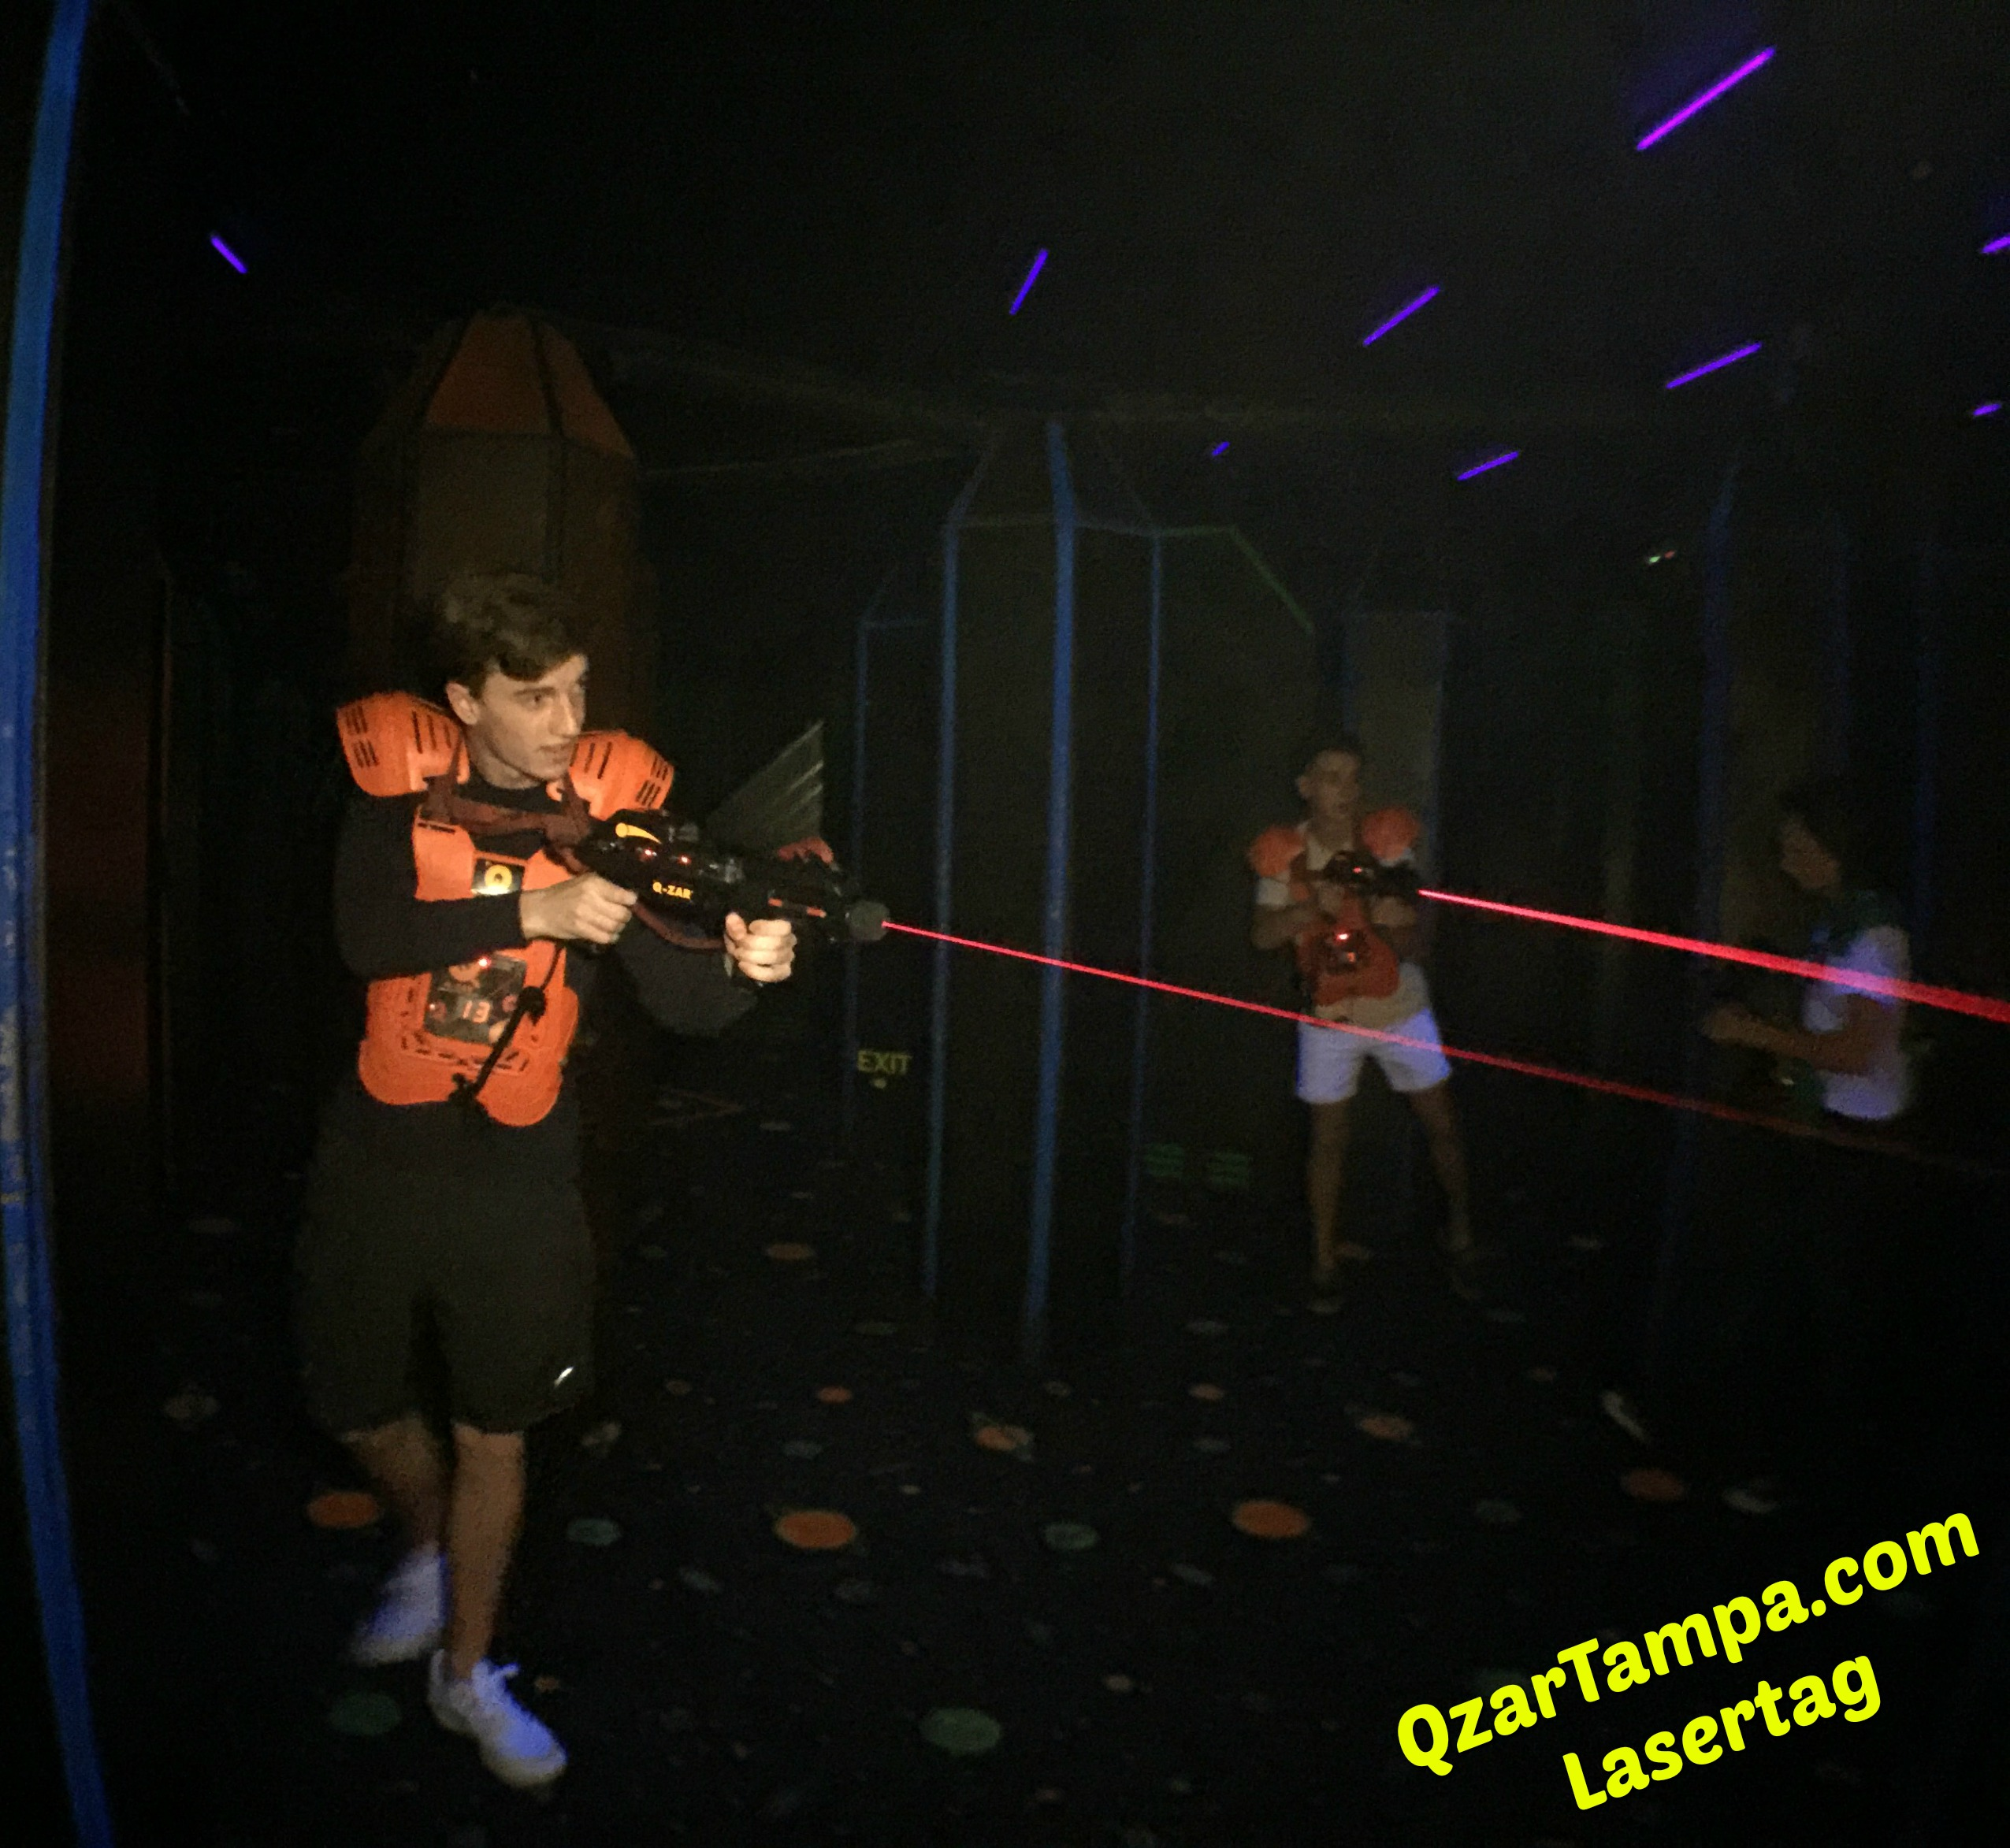 Q-Zar Laser Tag